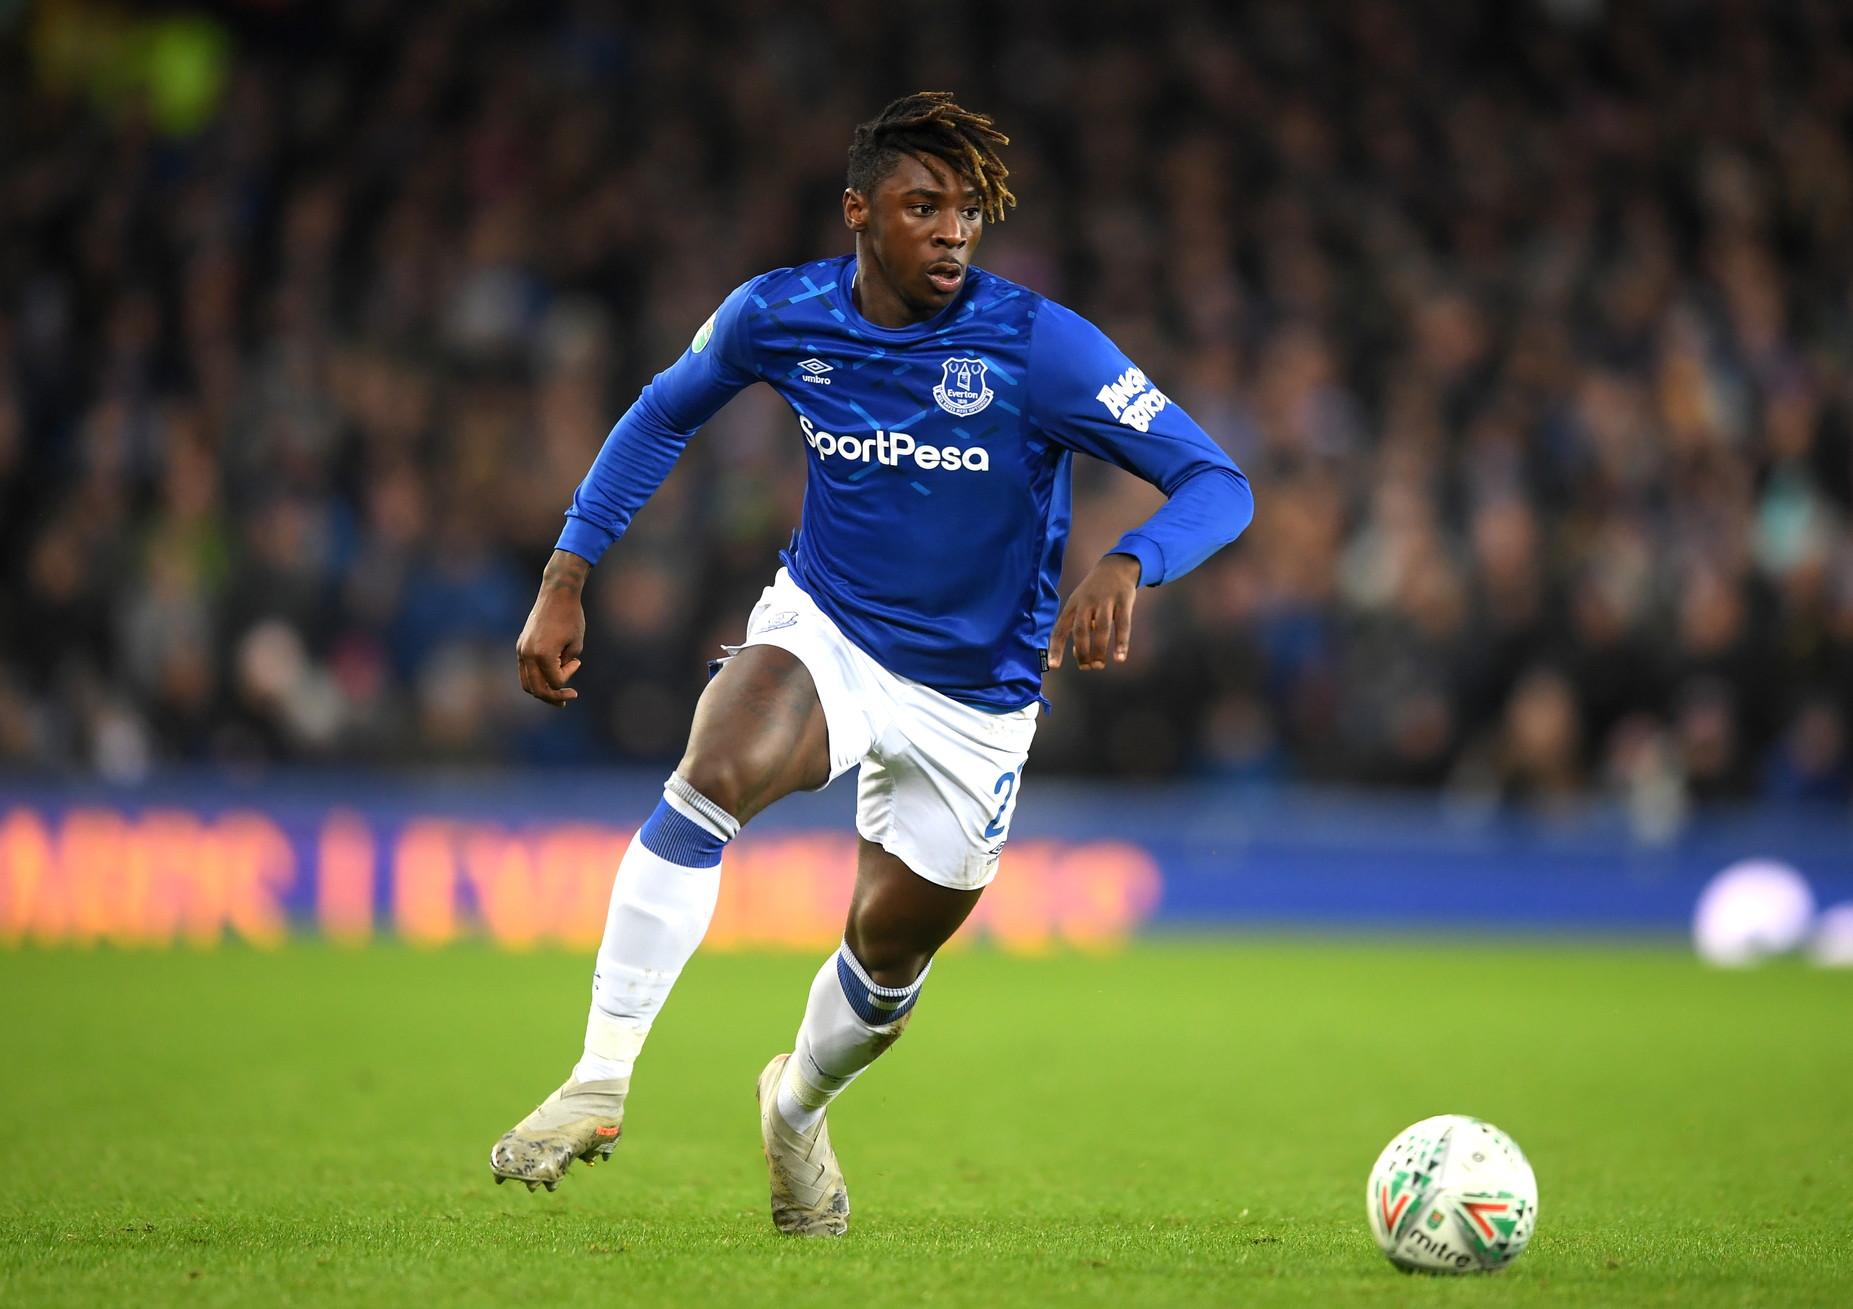 Moise Kean (Everton): 56,2 milioni